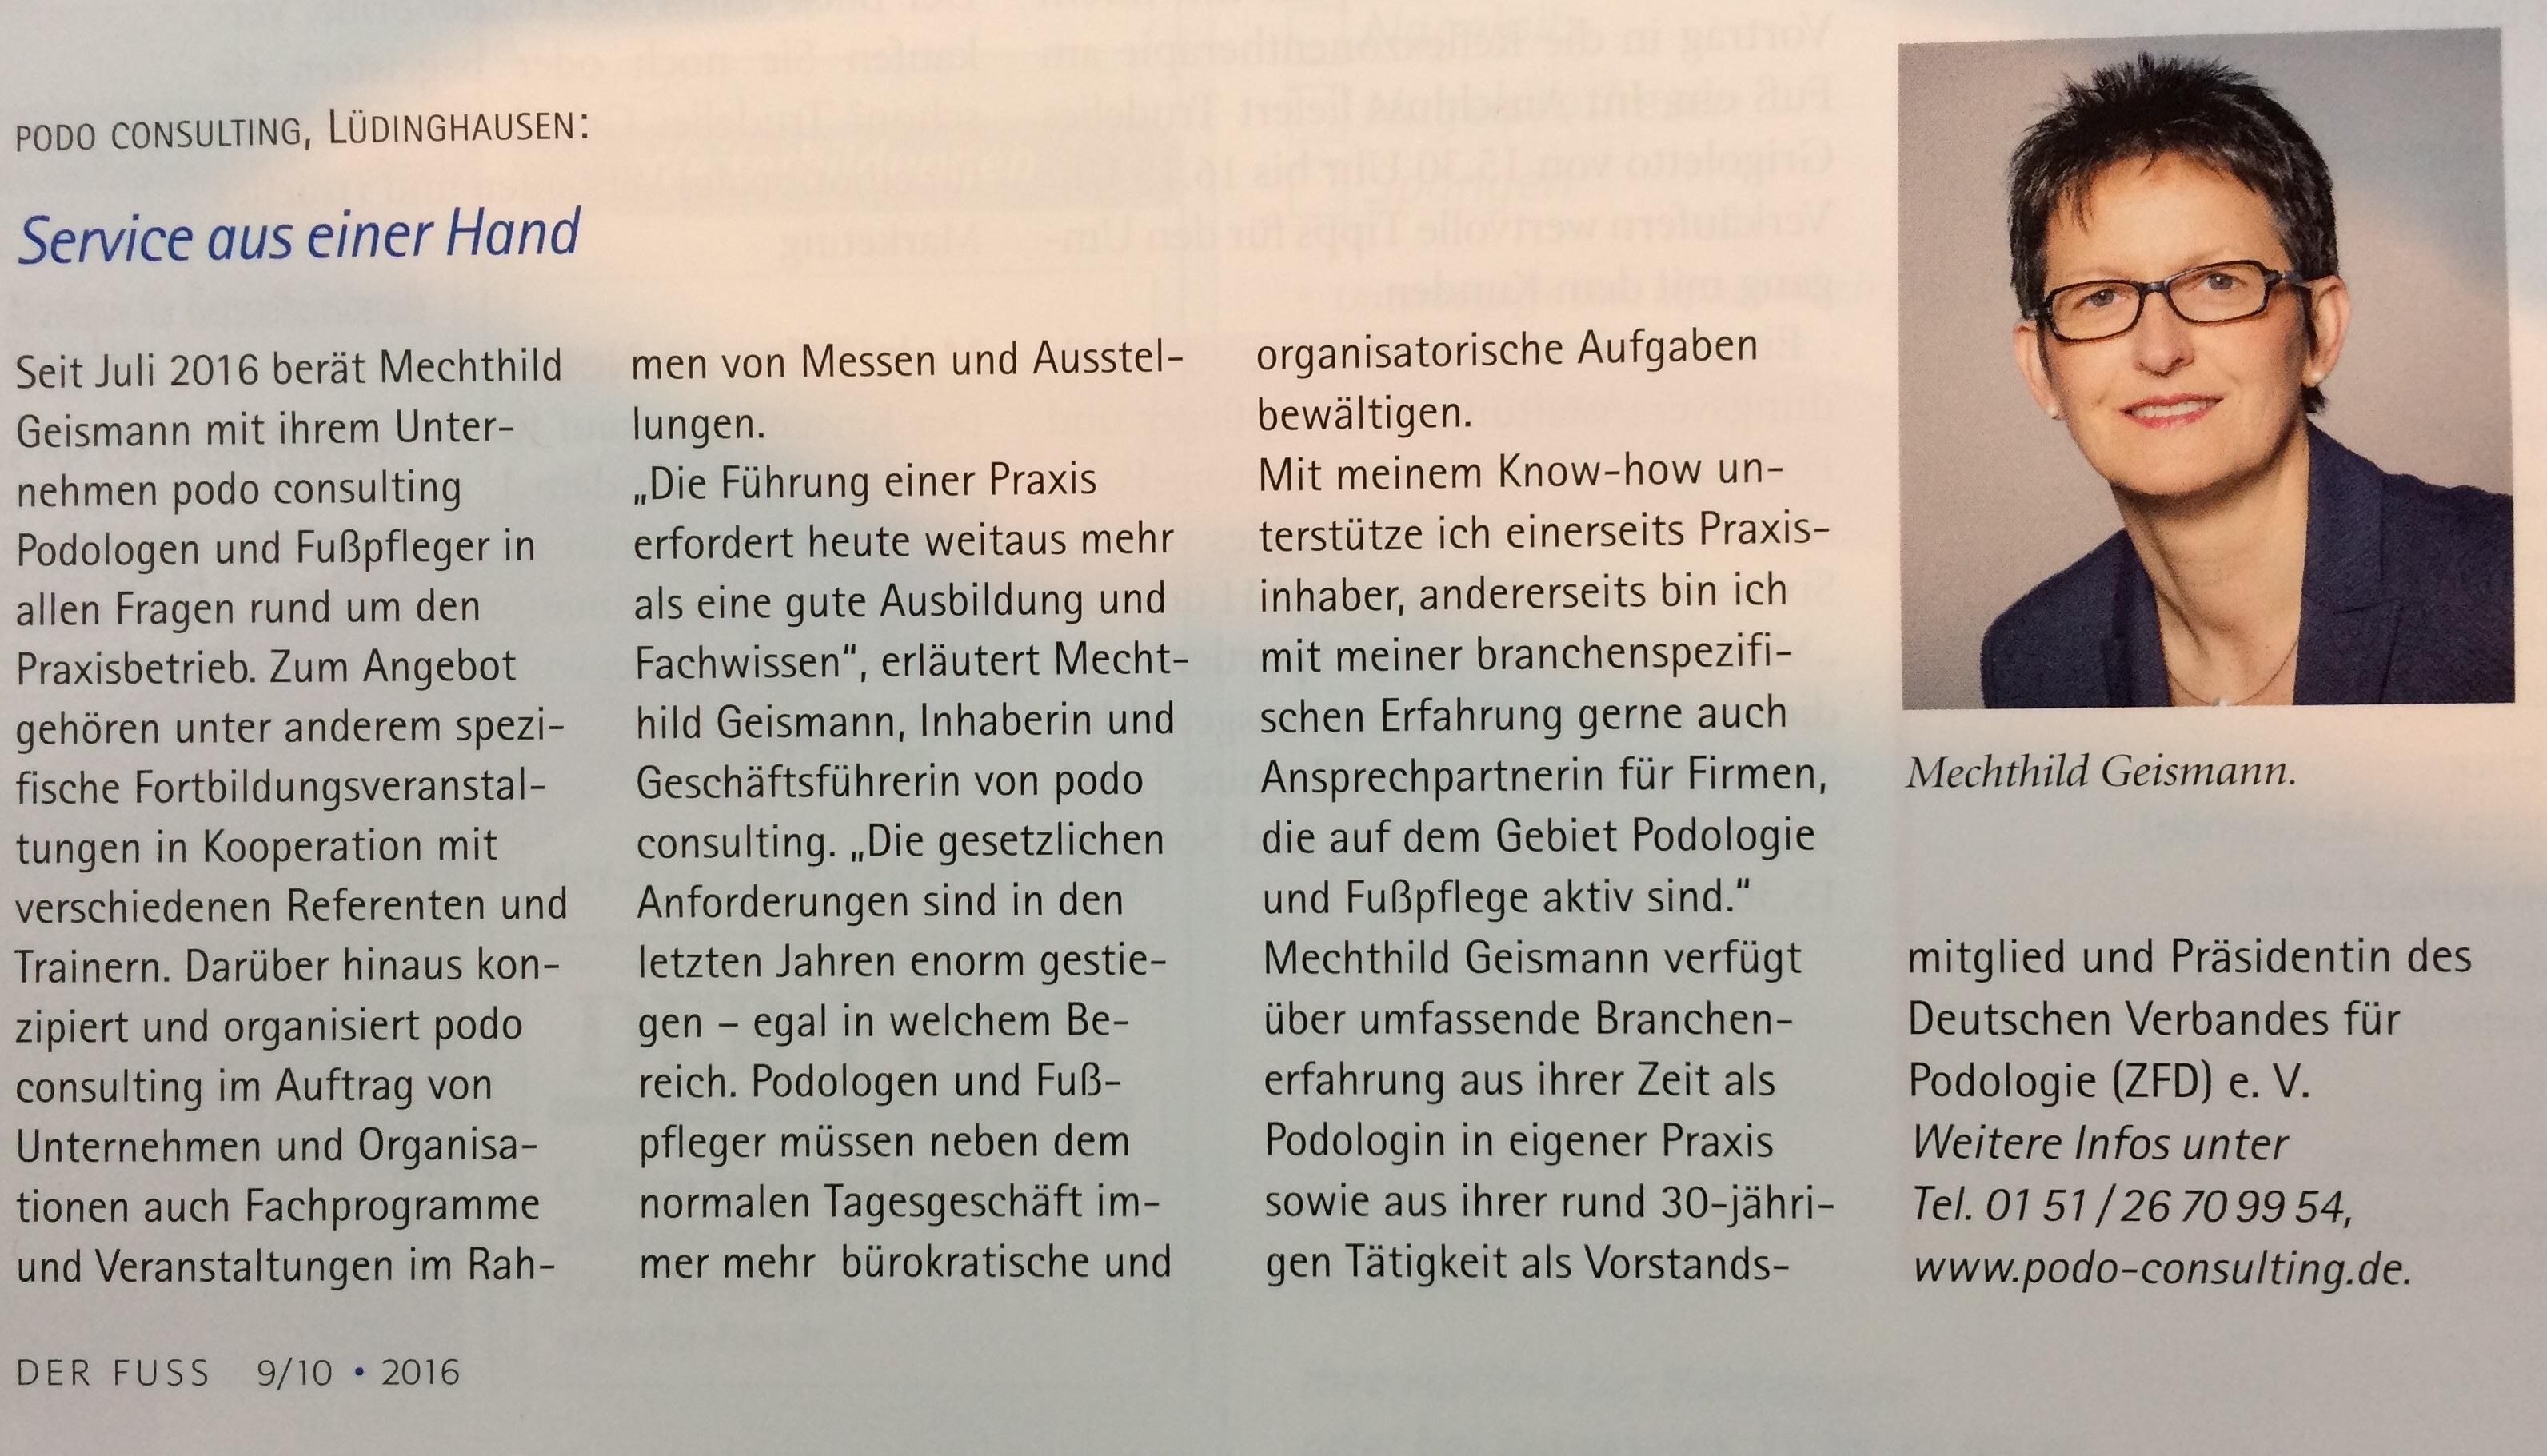 Panorama über podo consulting in DER FUSS - podo consulting